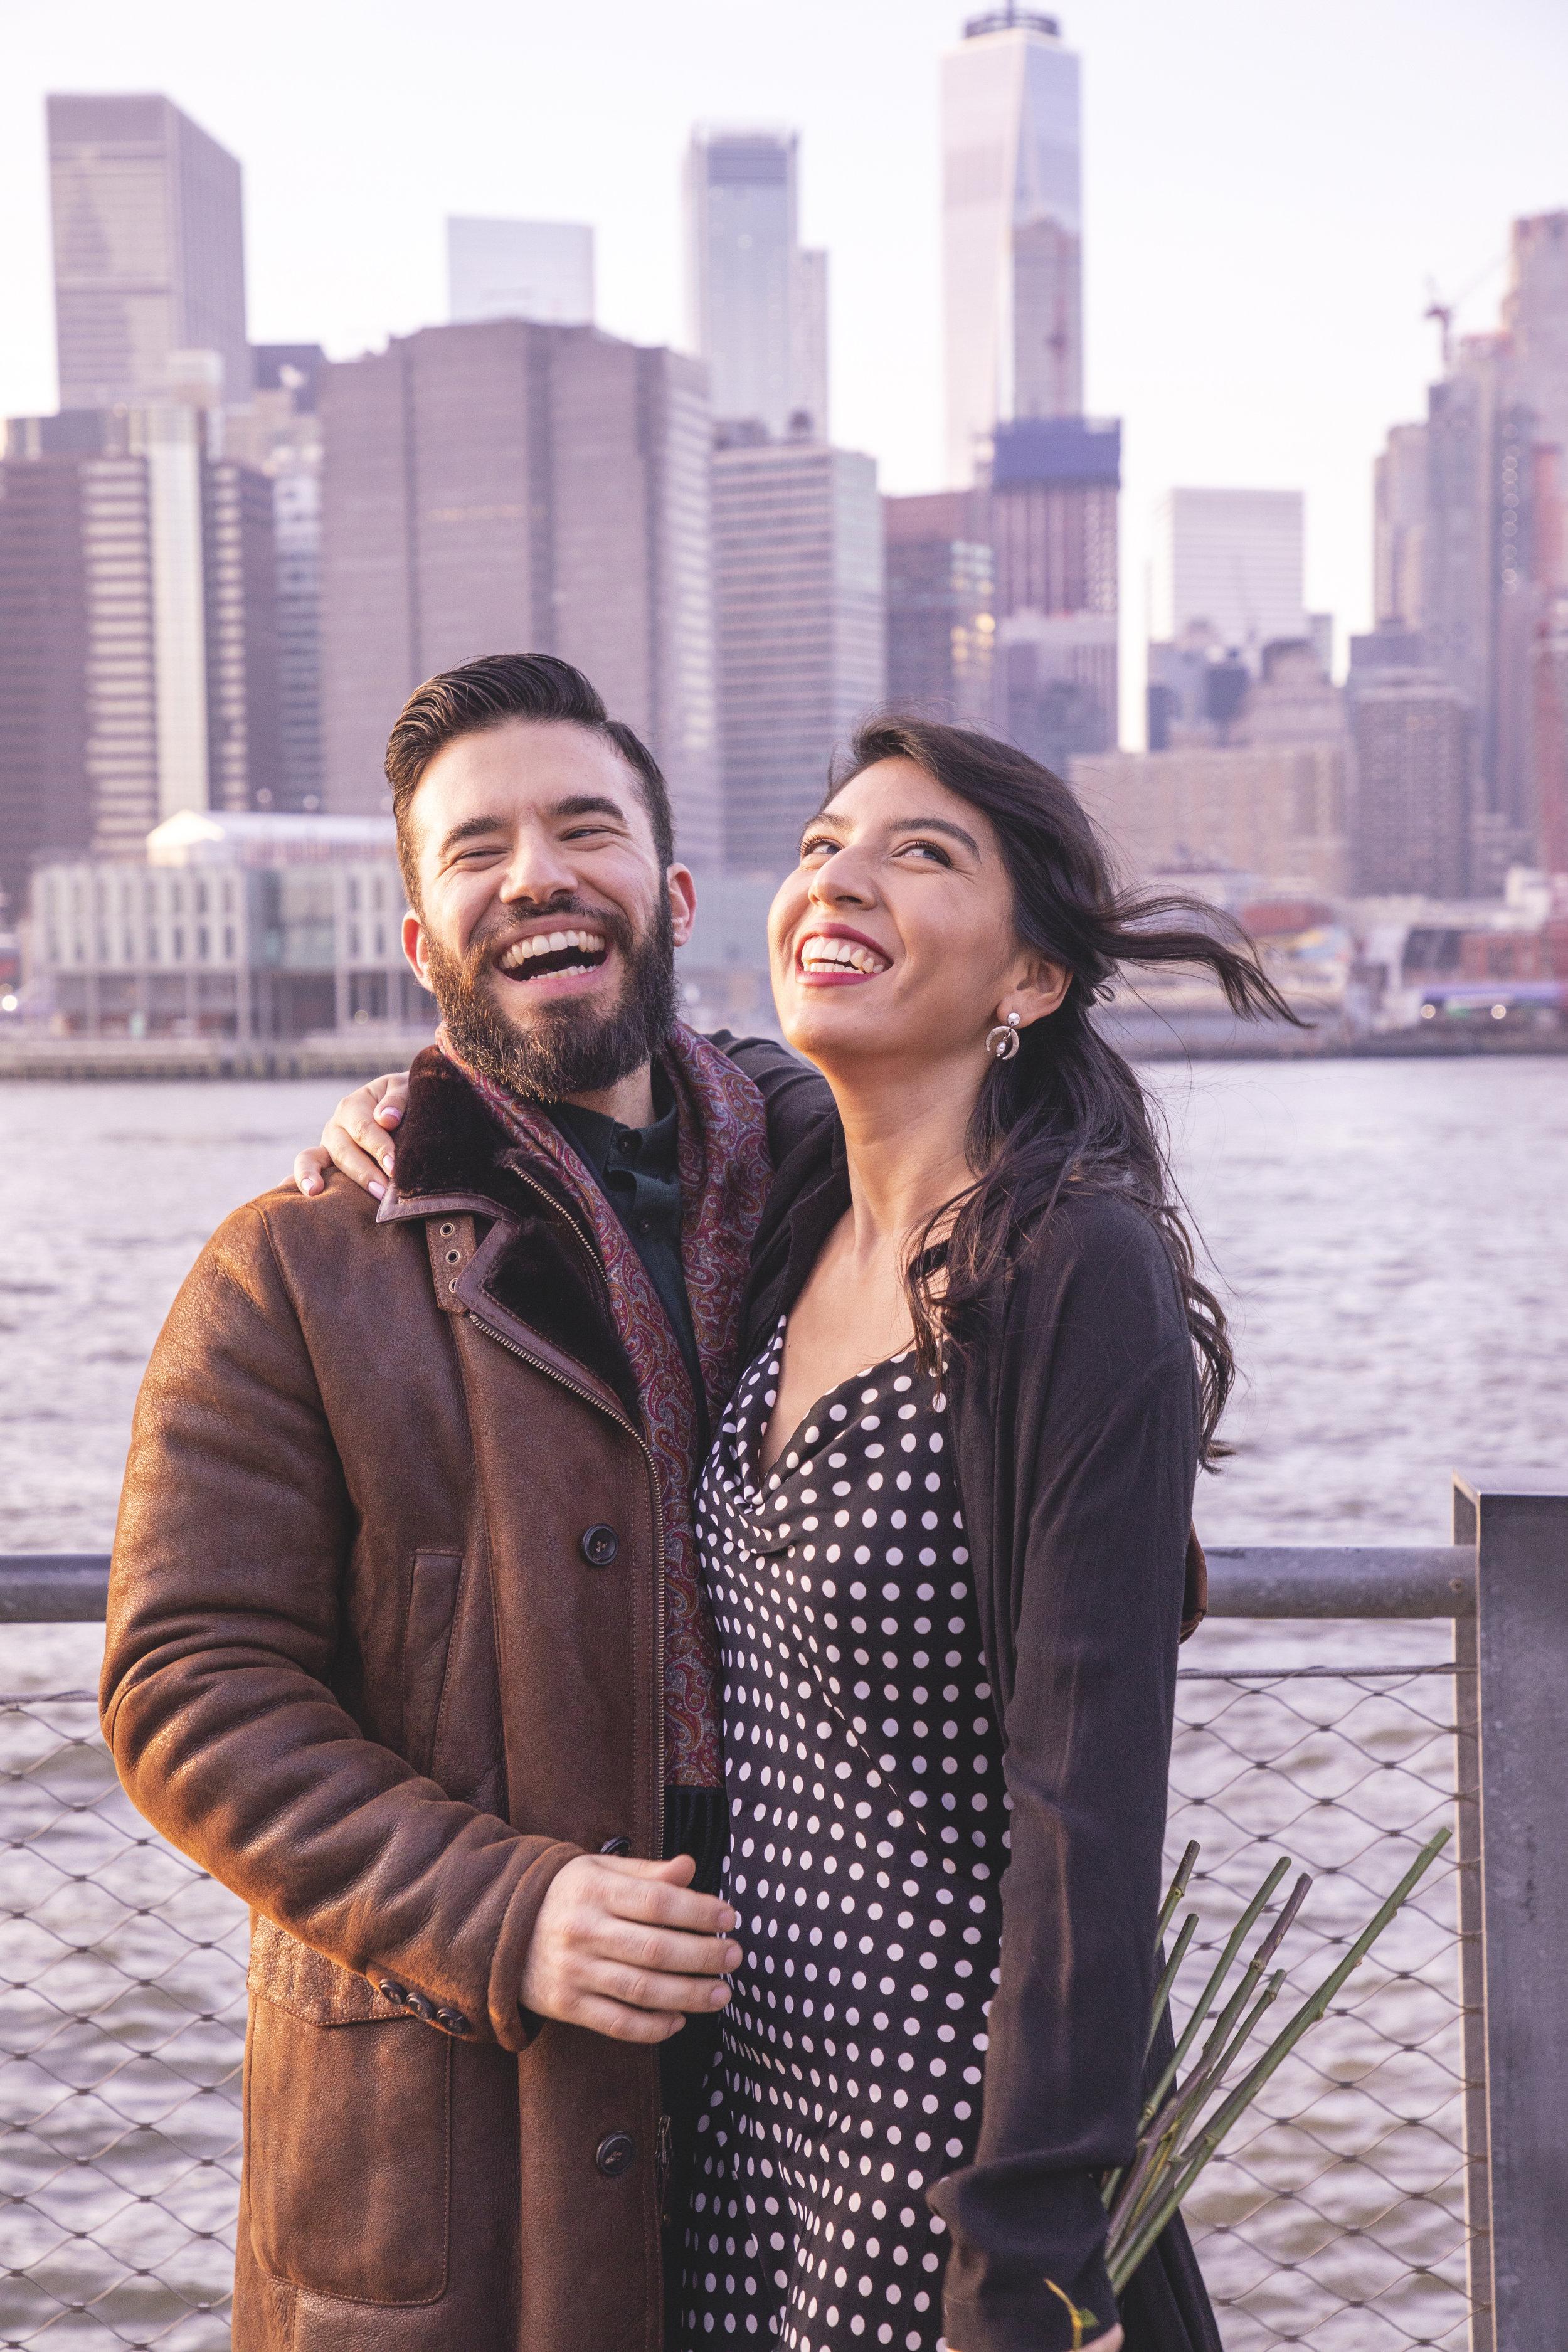 andrea & michael - BROOKLYN, NYC